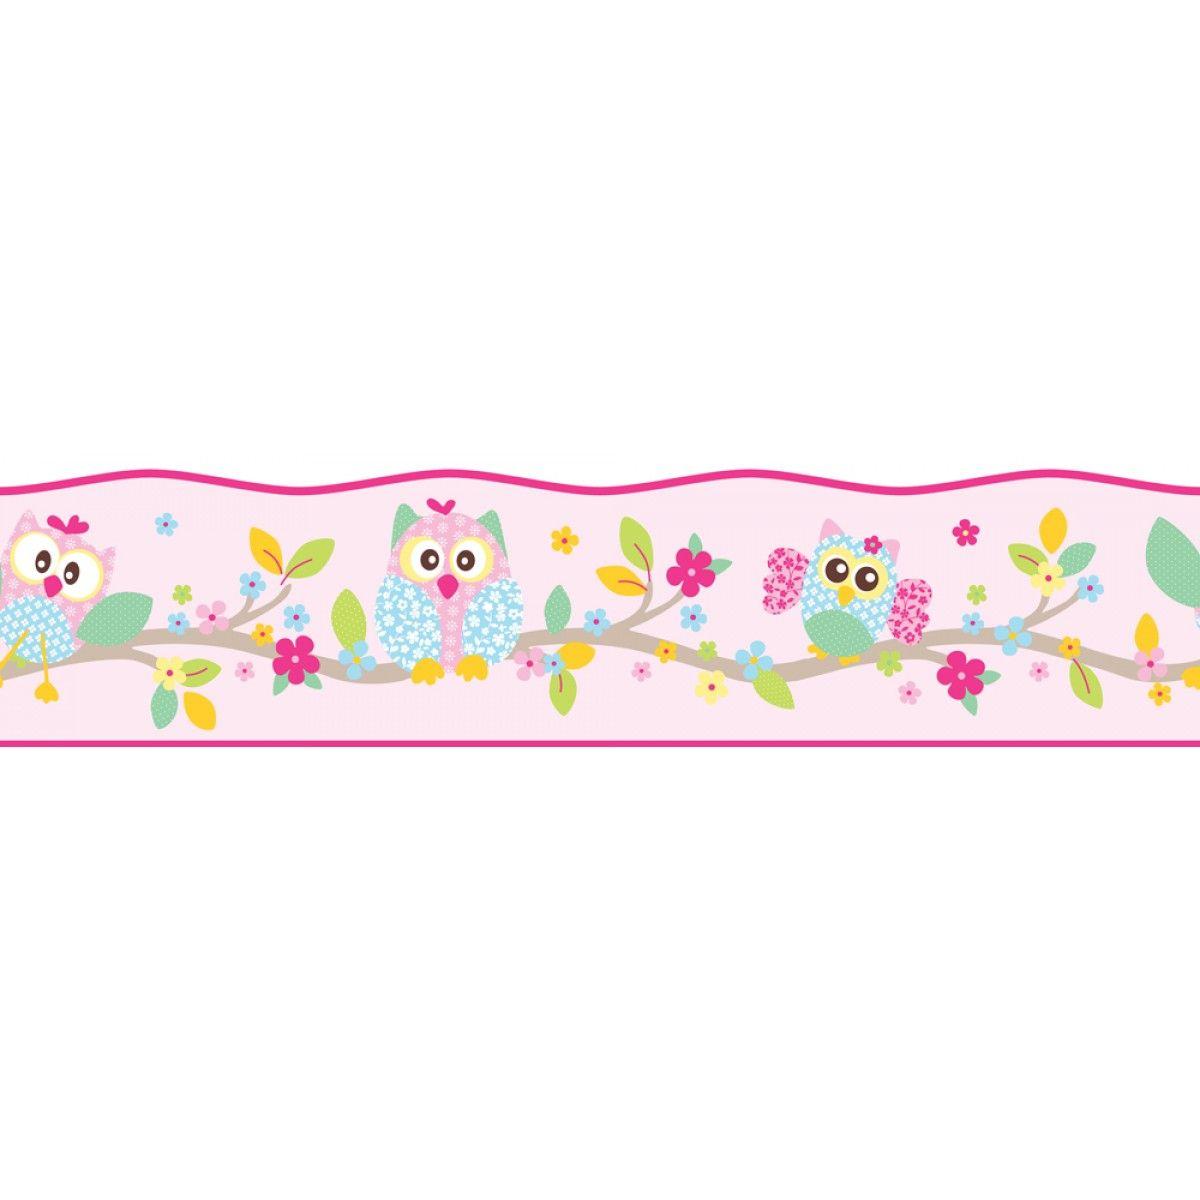 Patchwork Owl Wallpaper Self Adhesive Border 5m